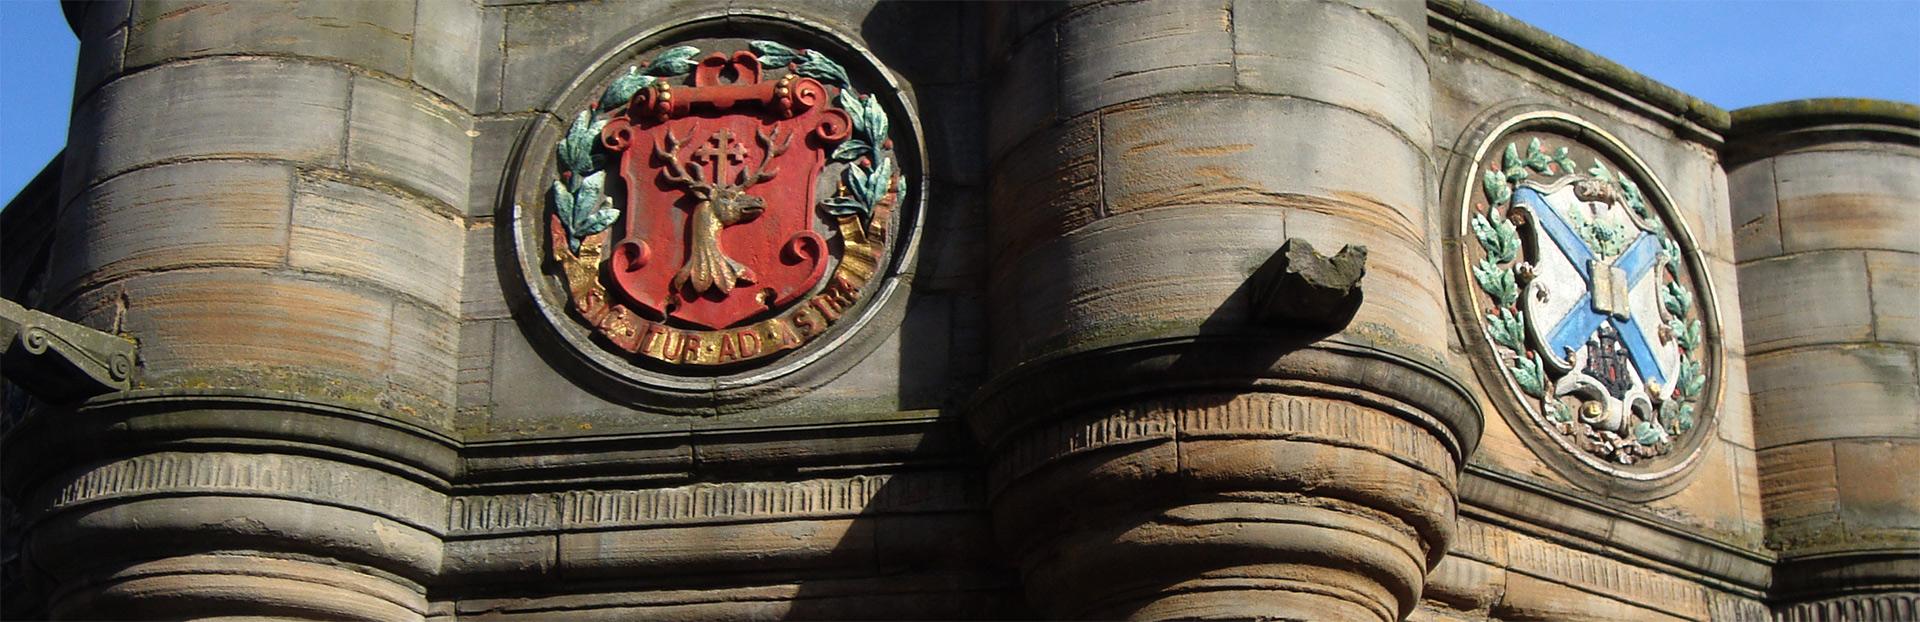 Edinburgh walking tour city of contrasts